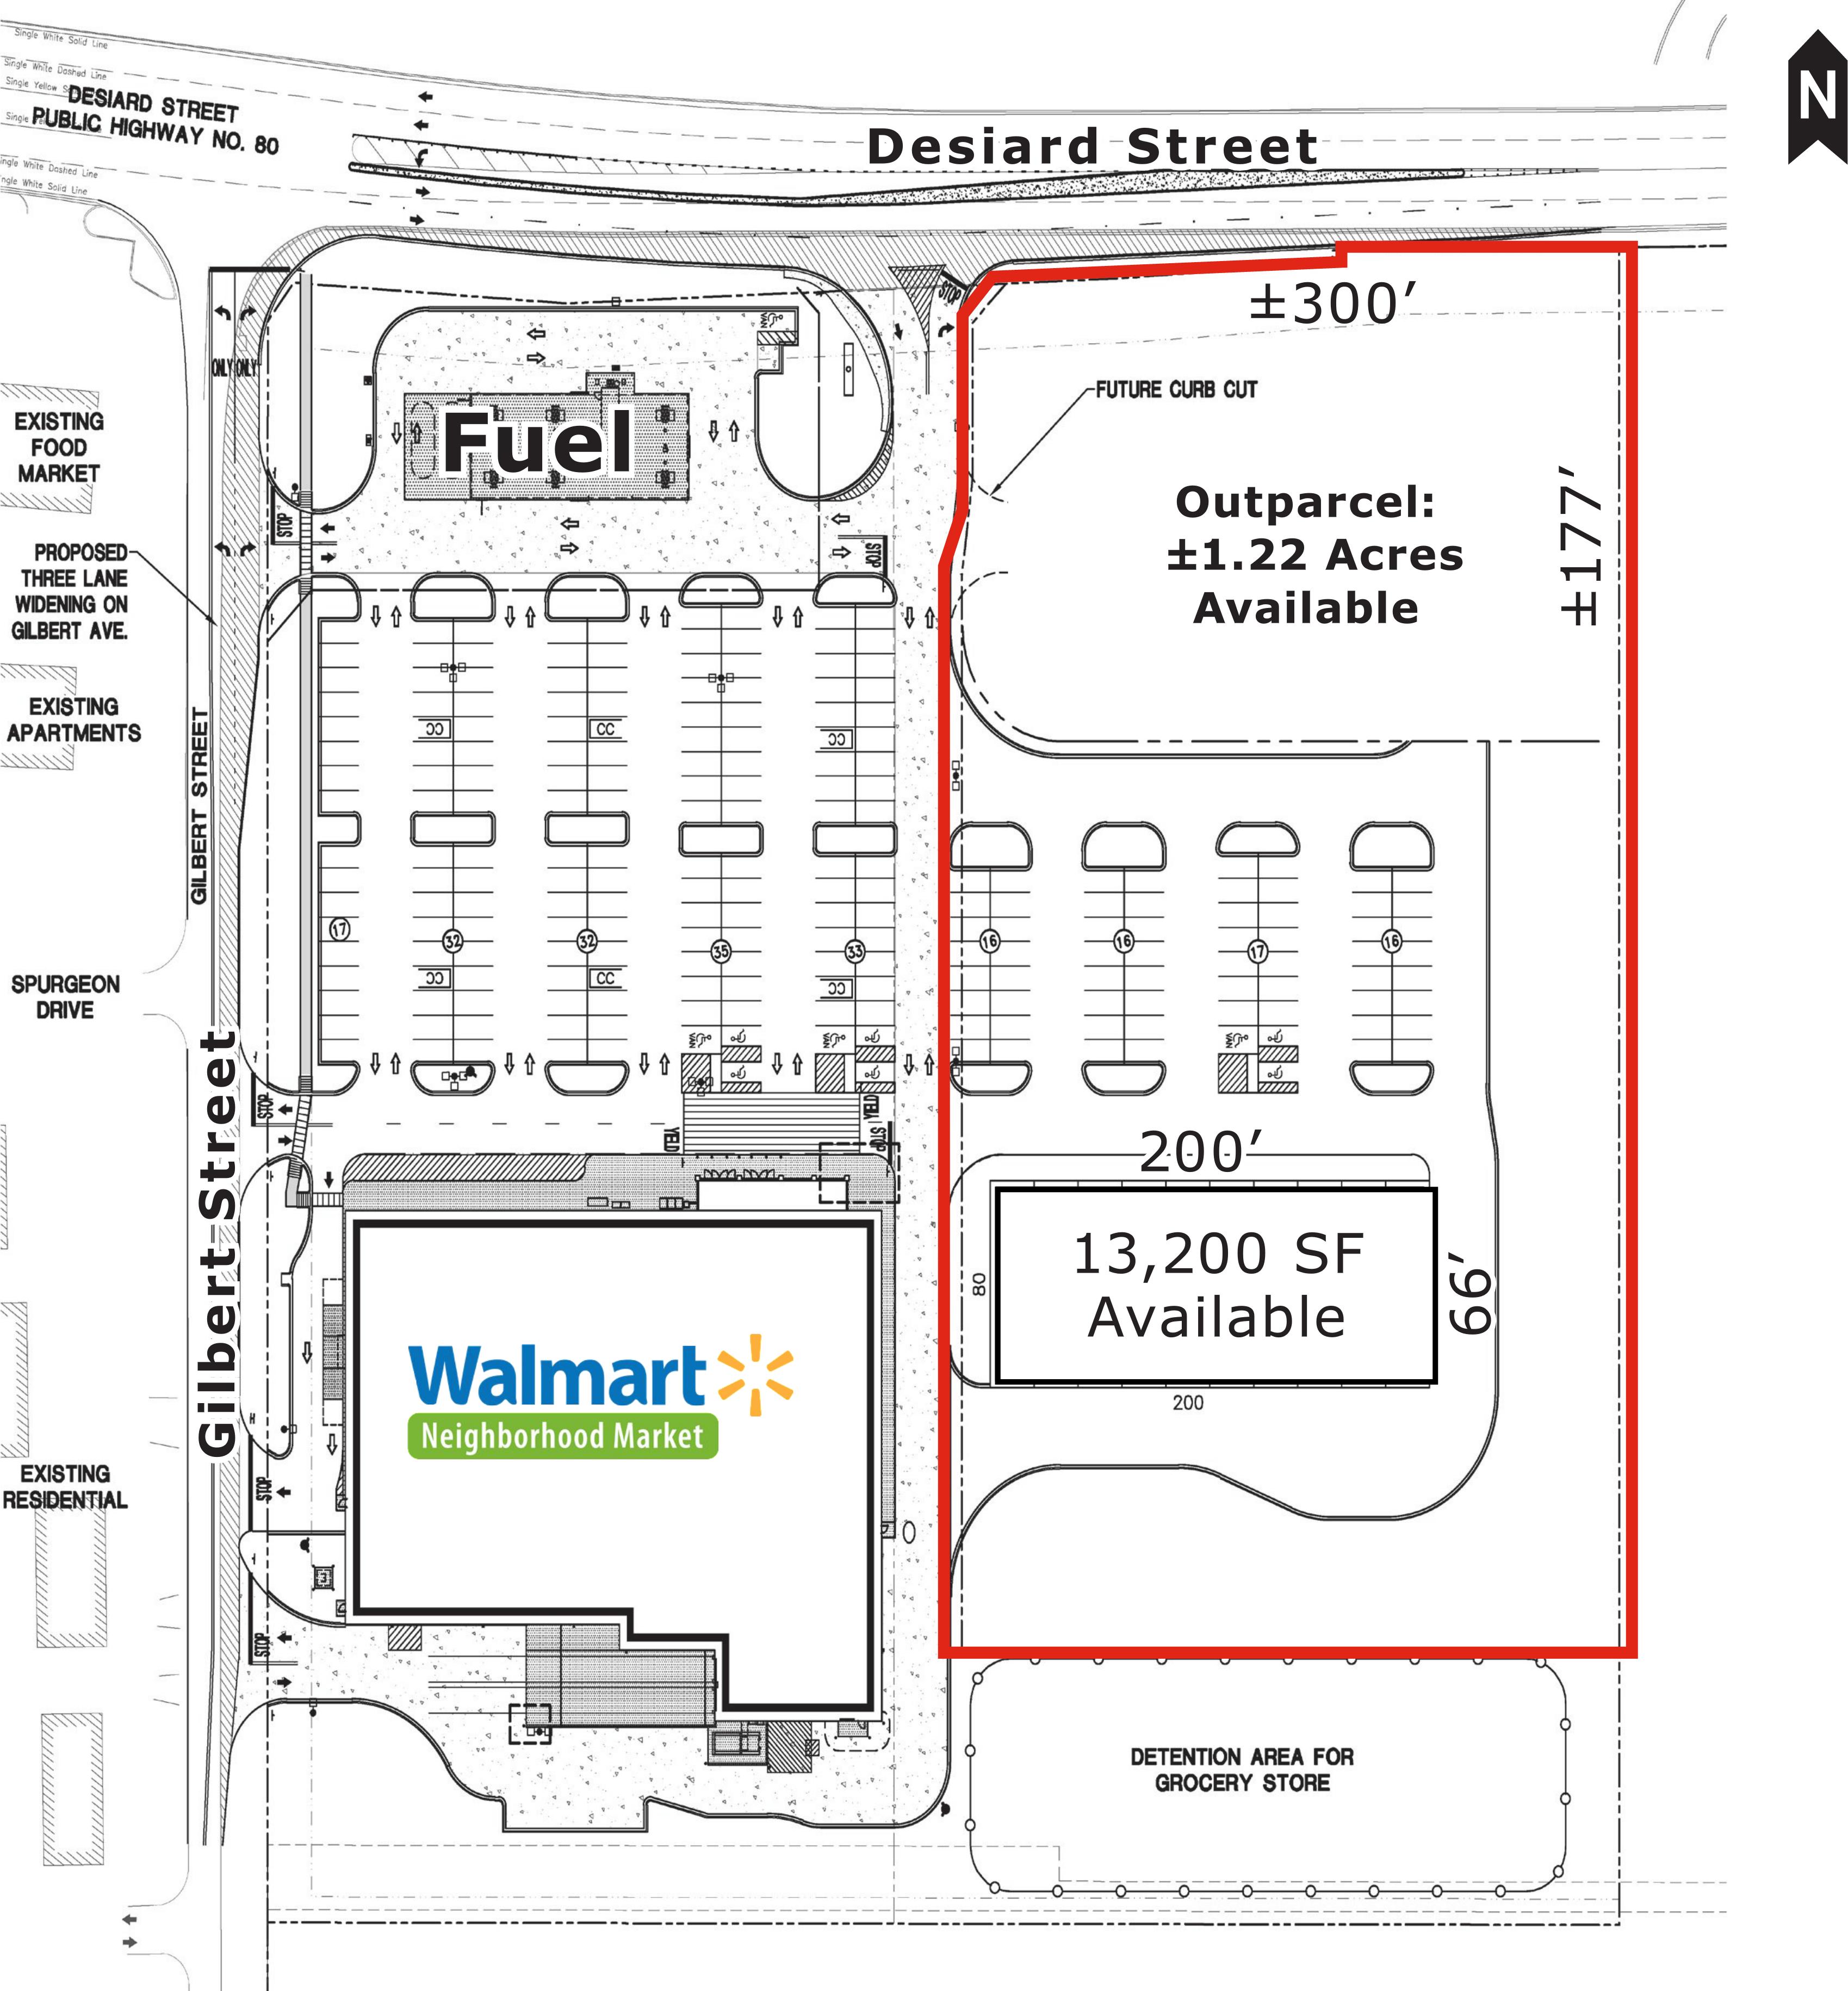 property capsule walmart neighborhood market shadow center outparcel retail development potential monroe la plans